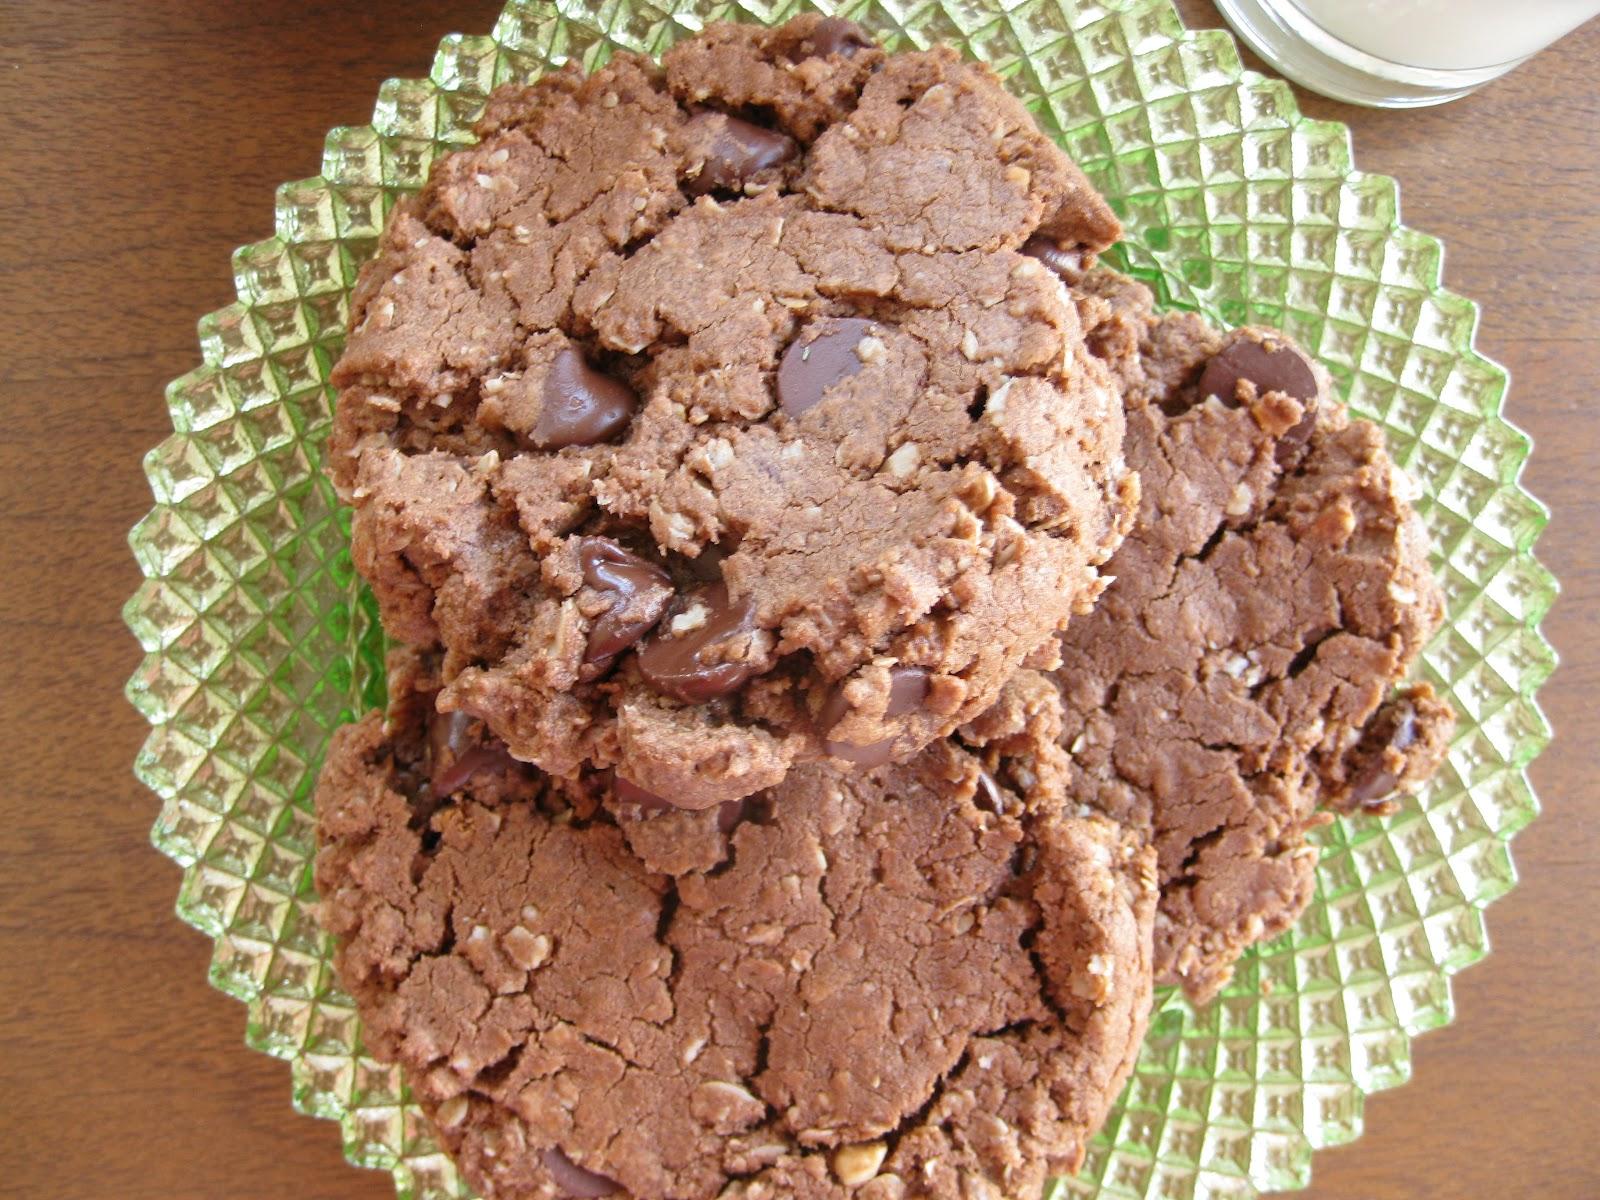 alipyper: Chocolate Peanut Butter Oatmeal Cookies